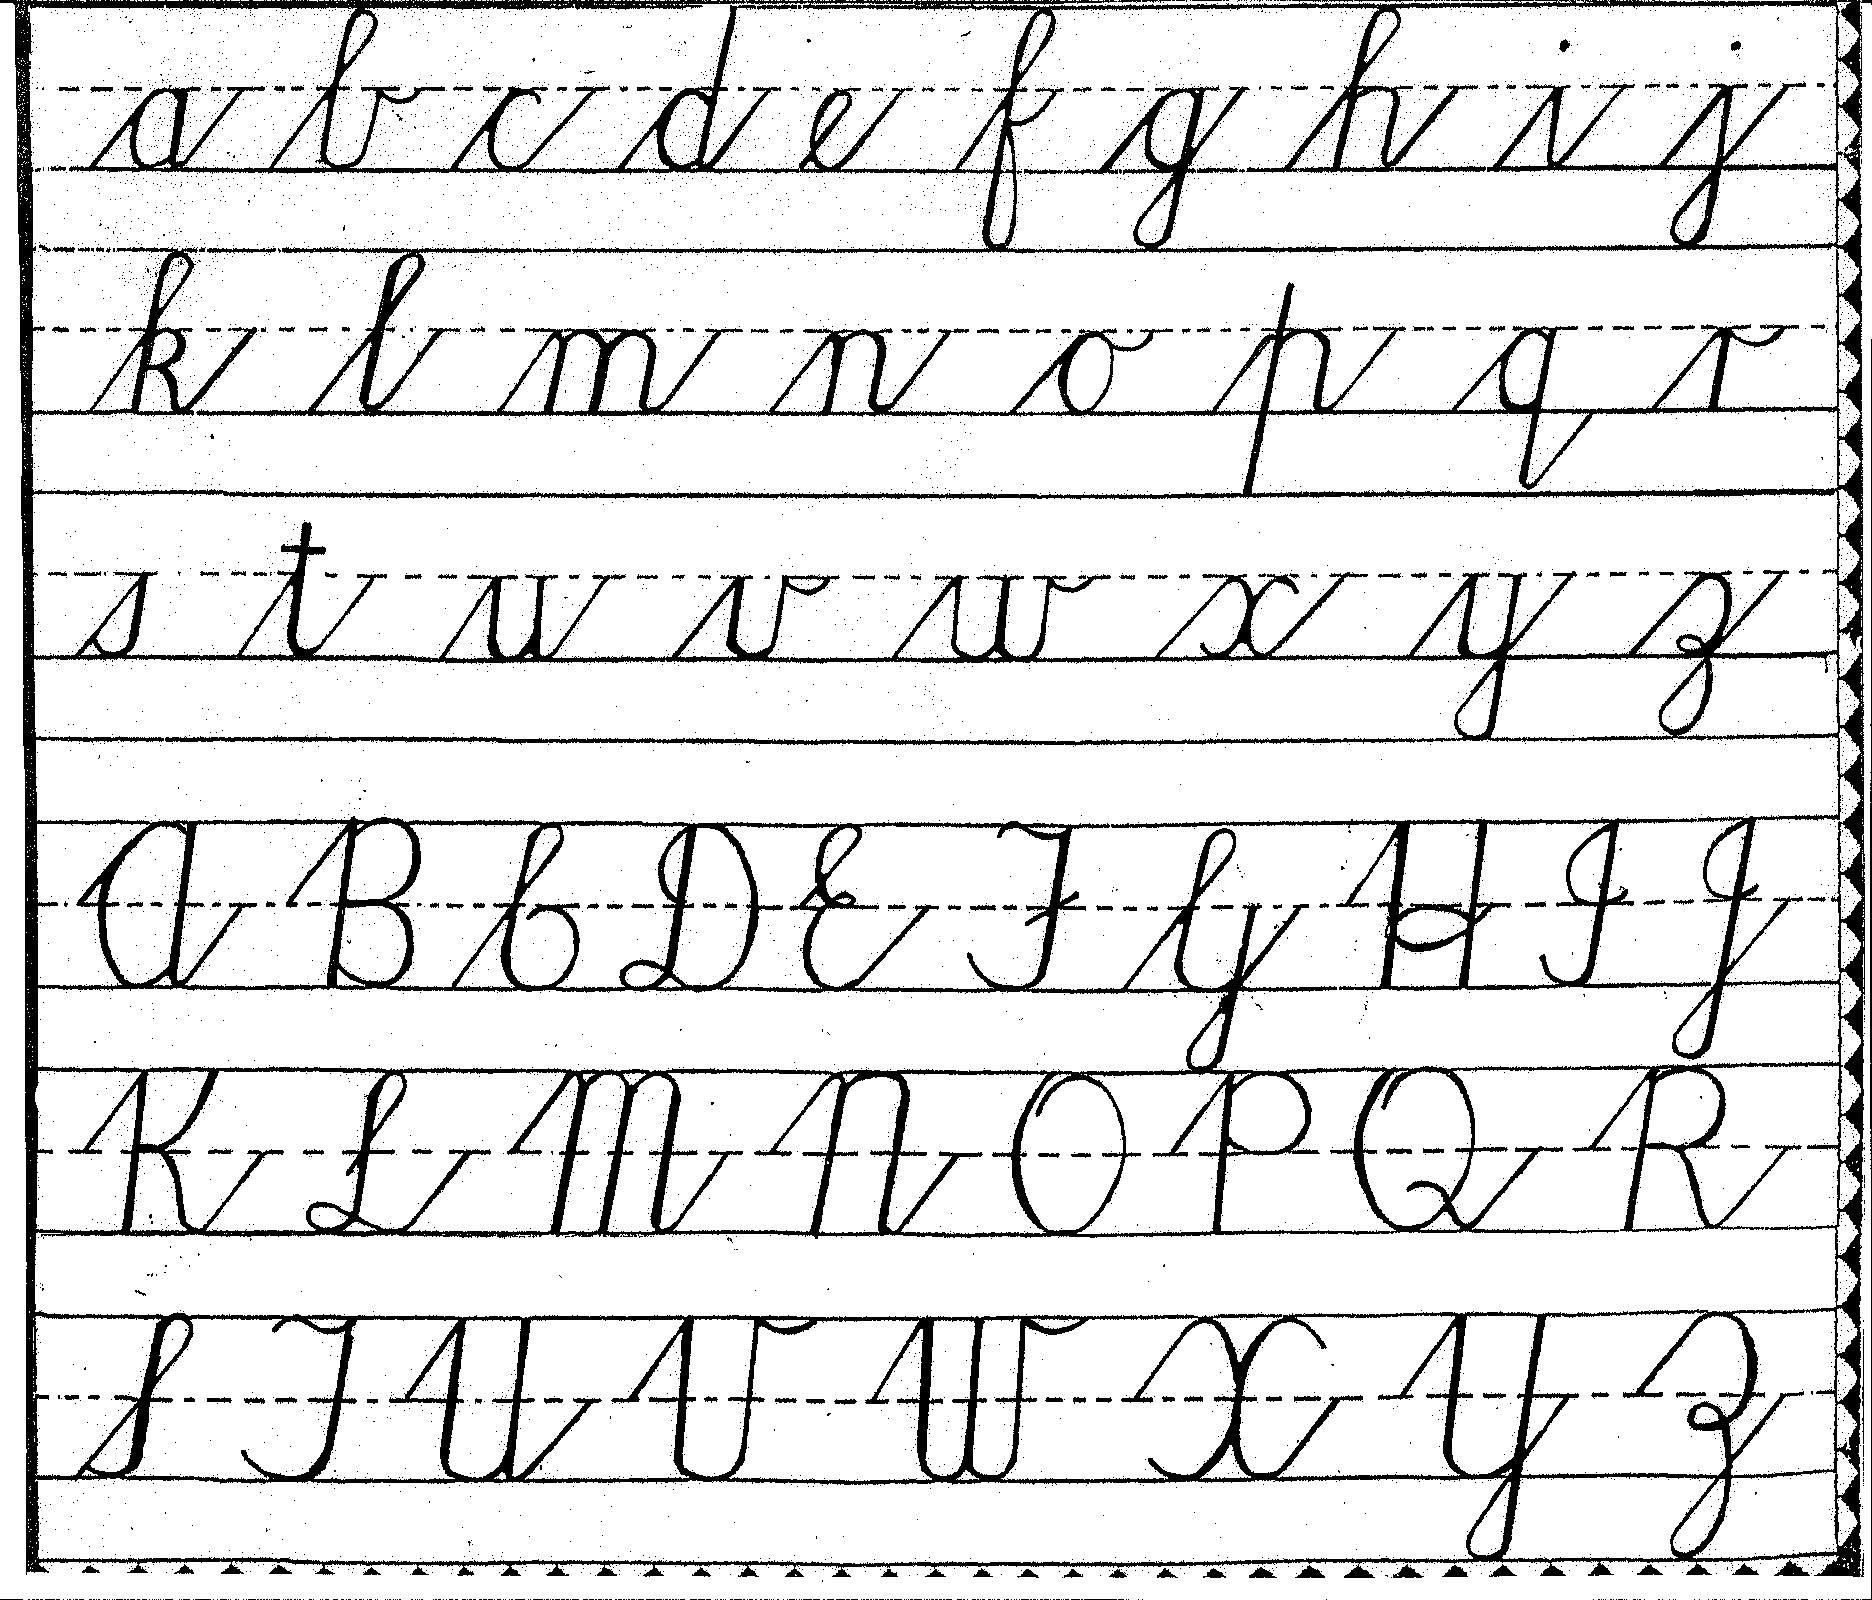 worksheet Create Your Own Handwriting Worksheets charming worksheet generator free maker handwriting cursivehand page amazing page